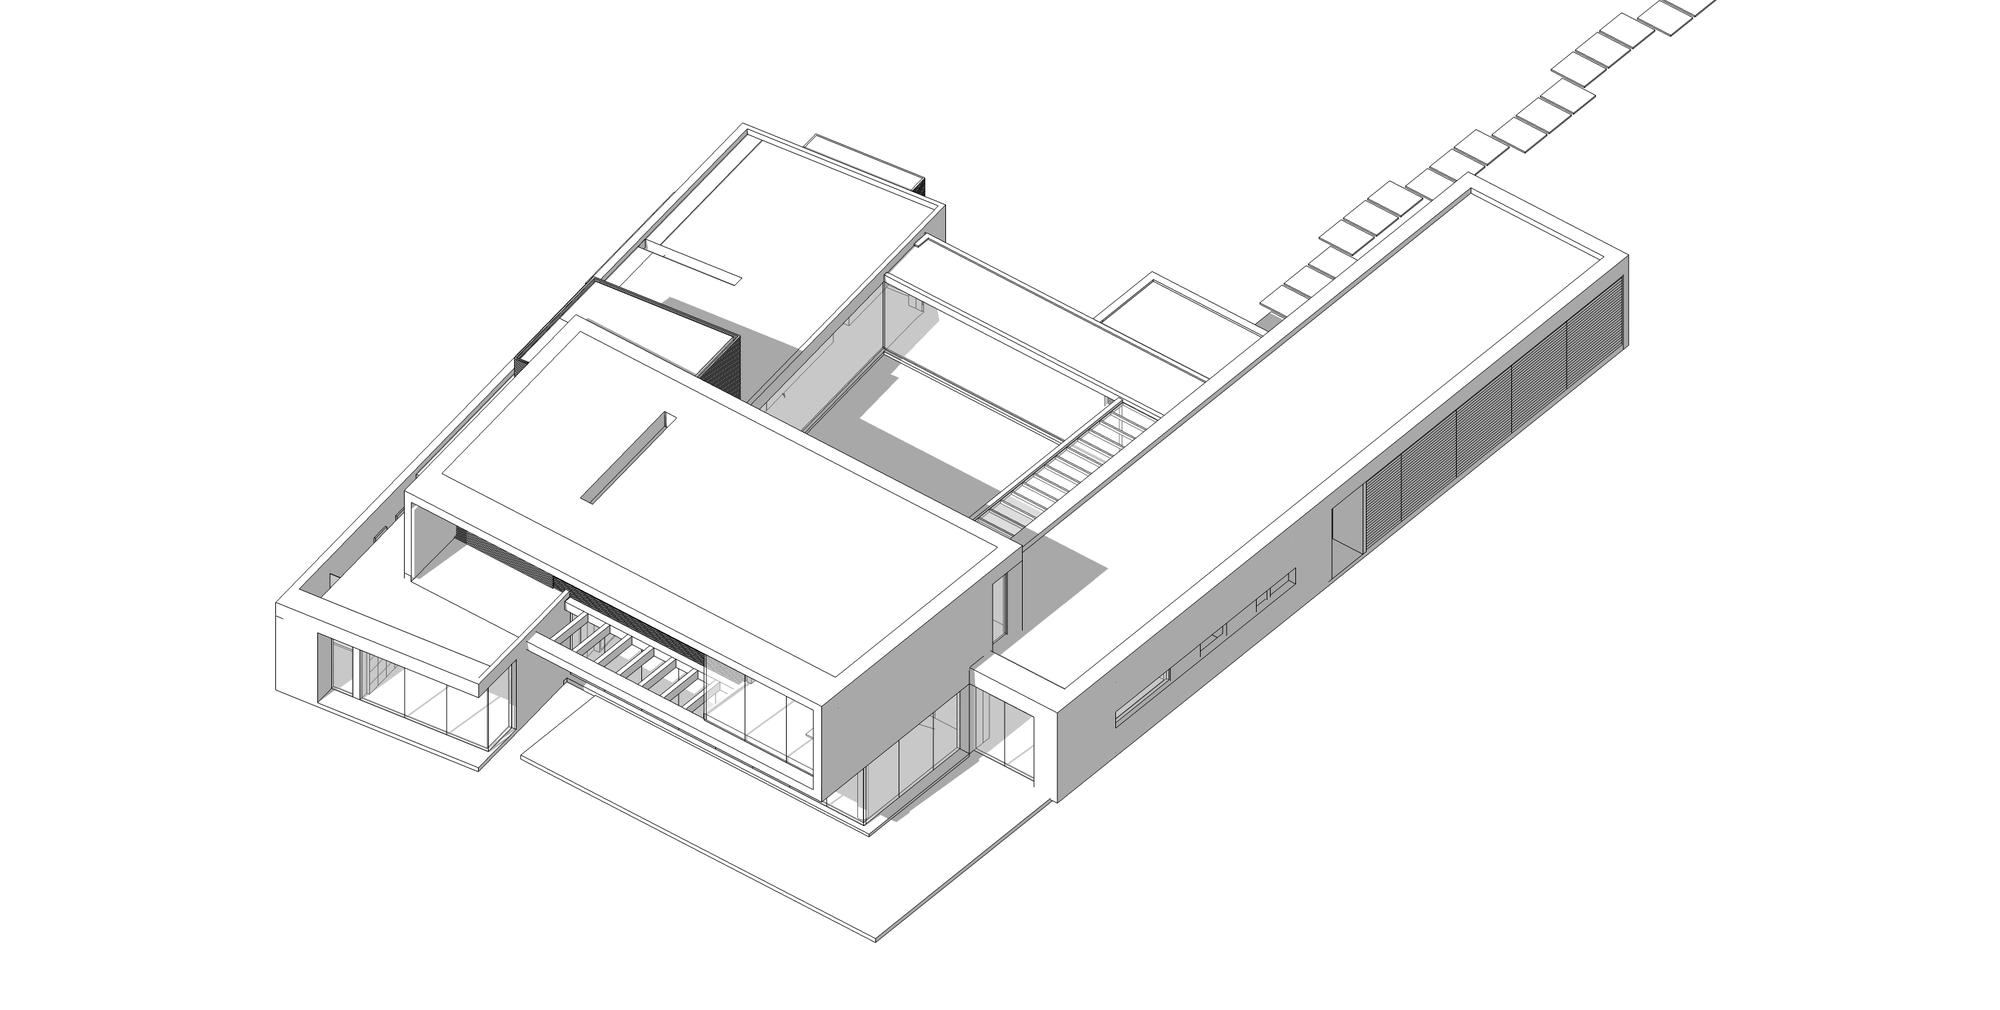 Galer a de casa 5 arquitectura en estudio 15 for Casa estudio arquitectura